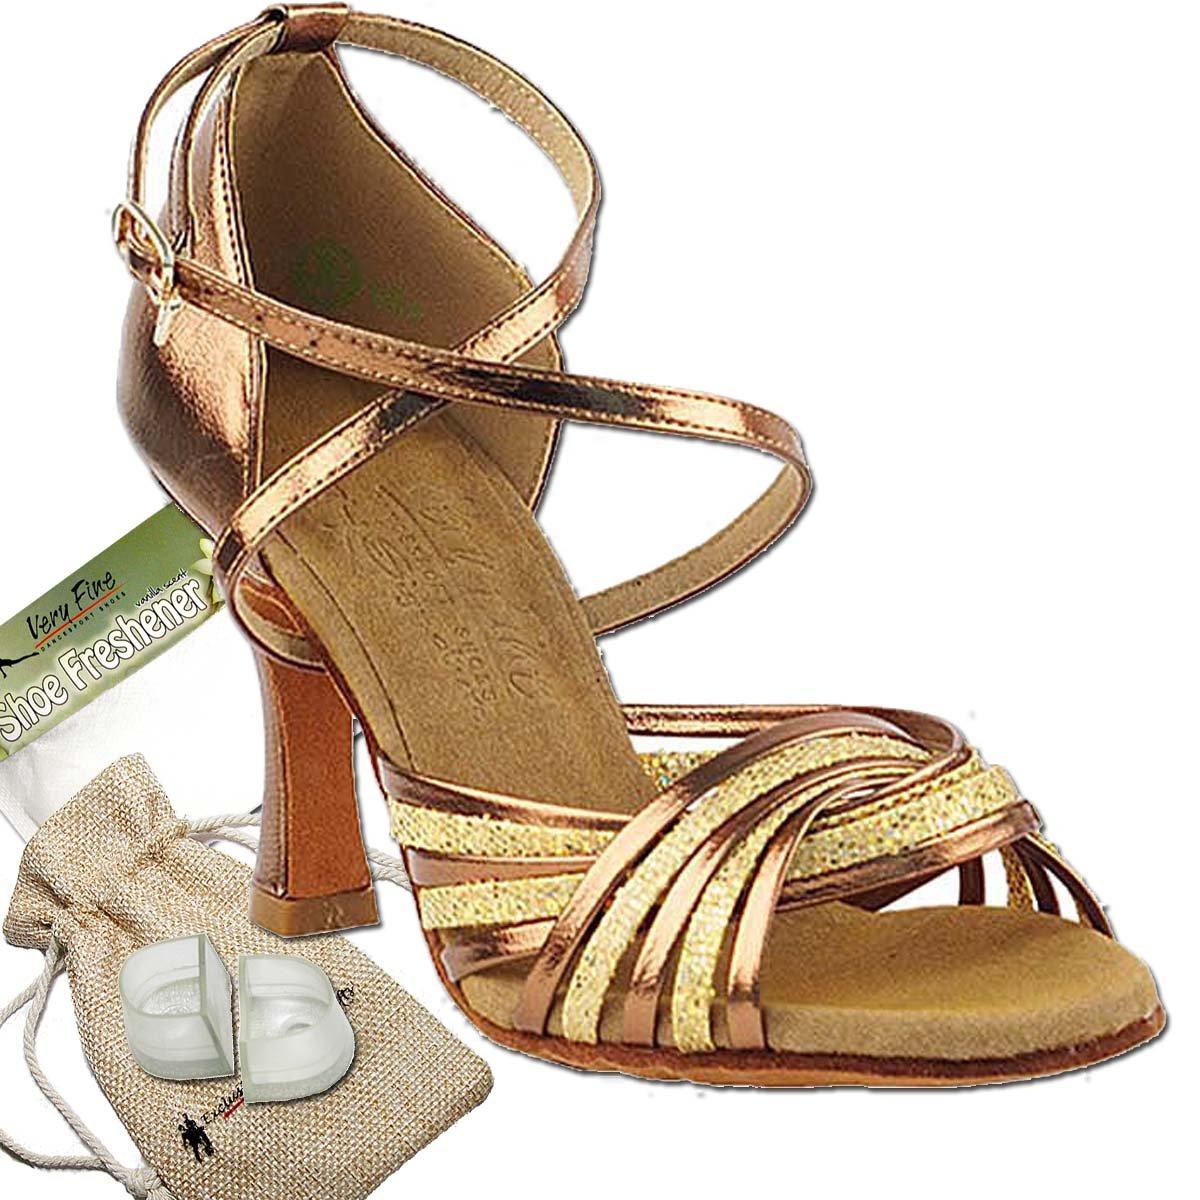 [Very Fine Dance Shoes] レディース B074WHVYLF Gold Scale & Dark Tan Gold 9.5 B(M) US